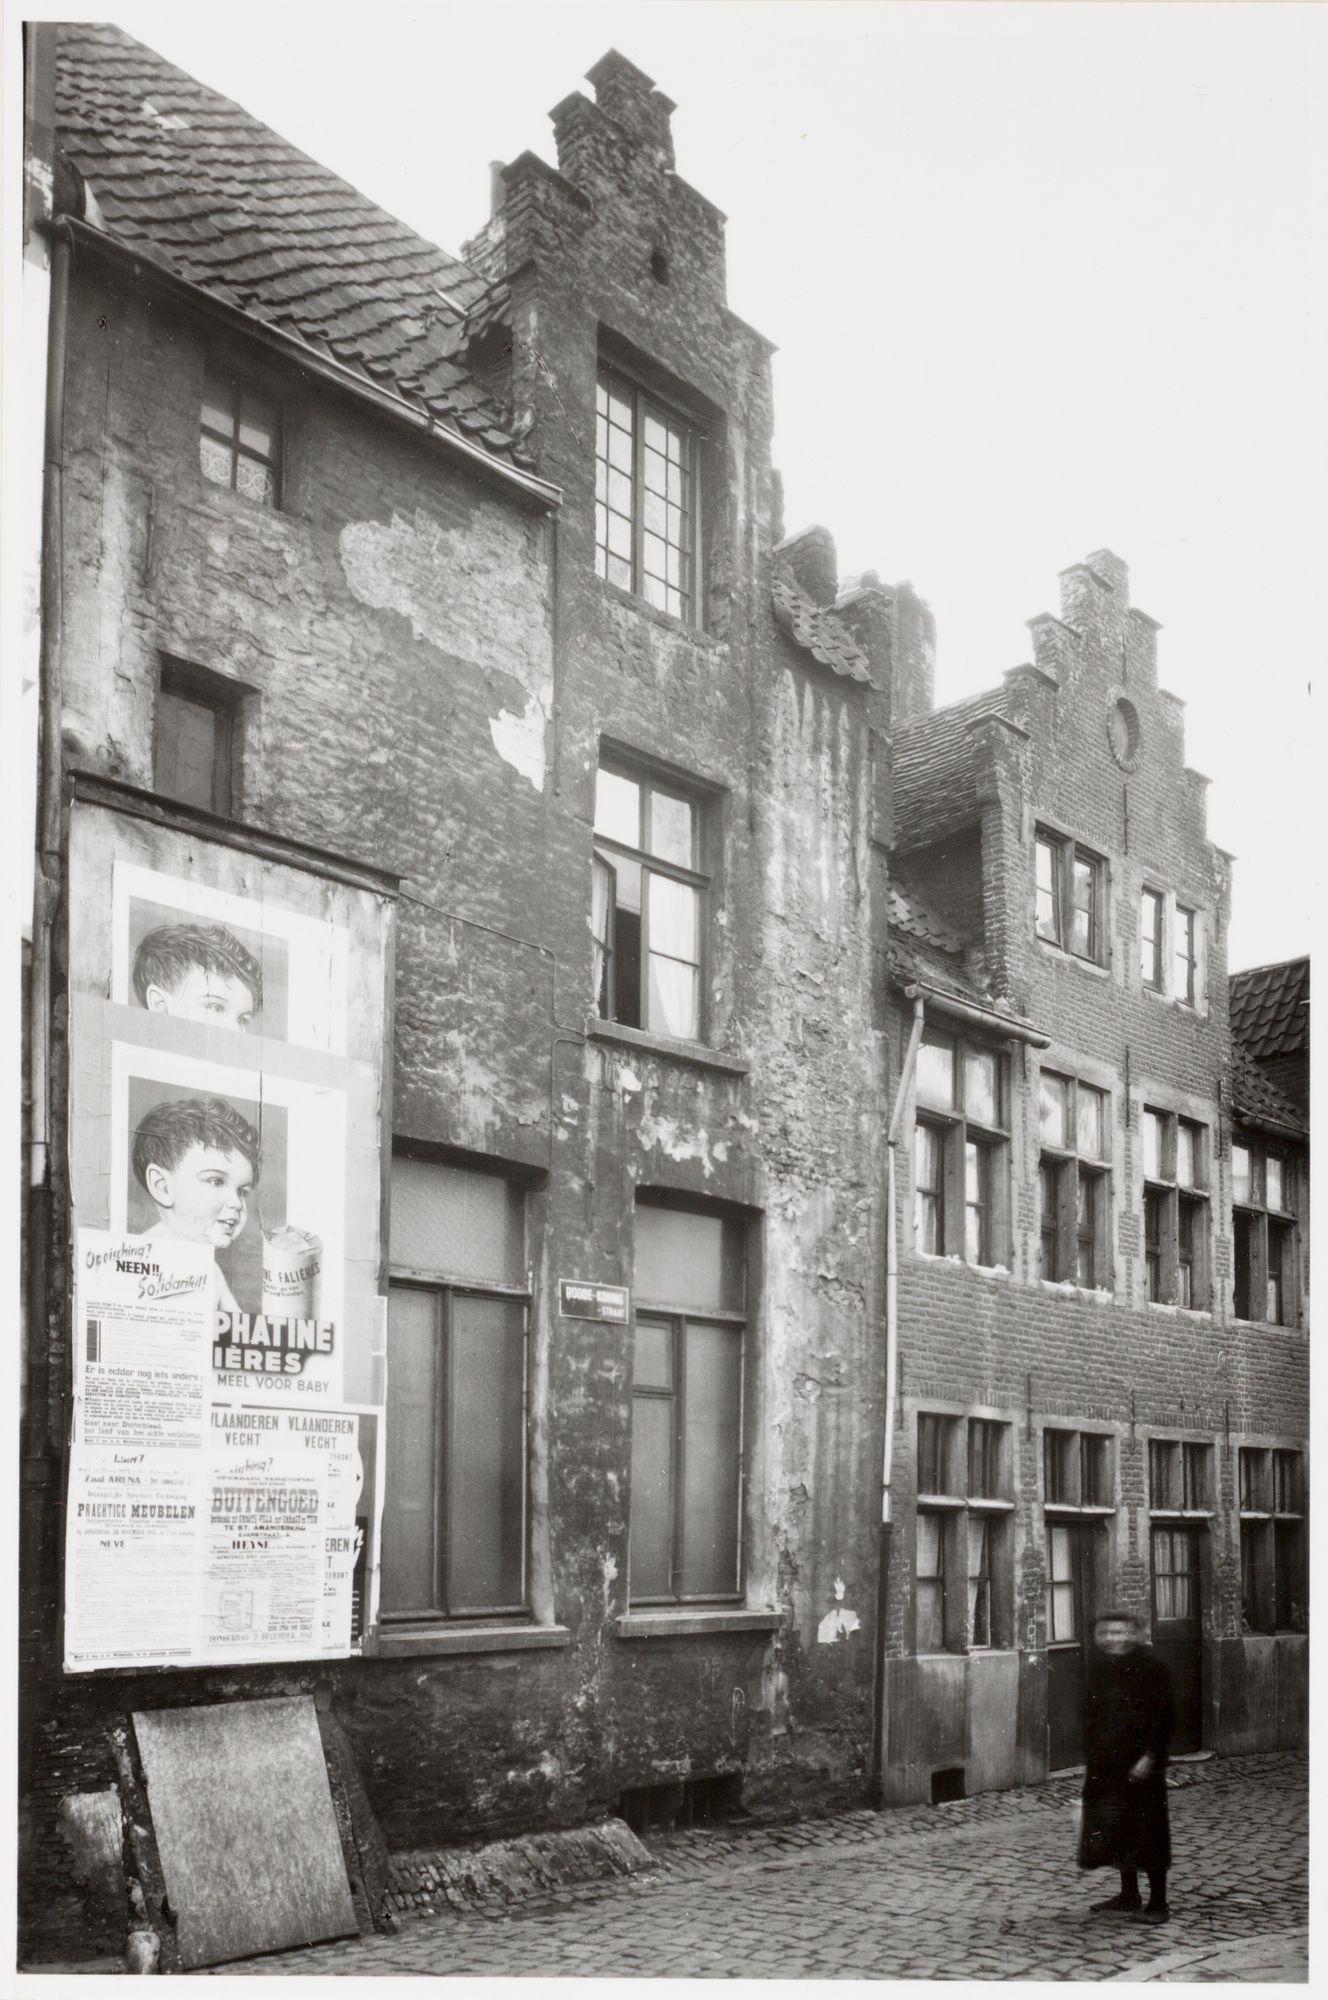 Gent: Trapgevelhuizen, Rodekoningstraat